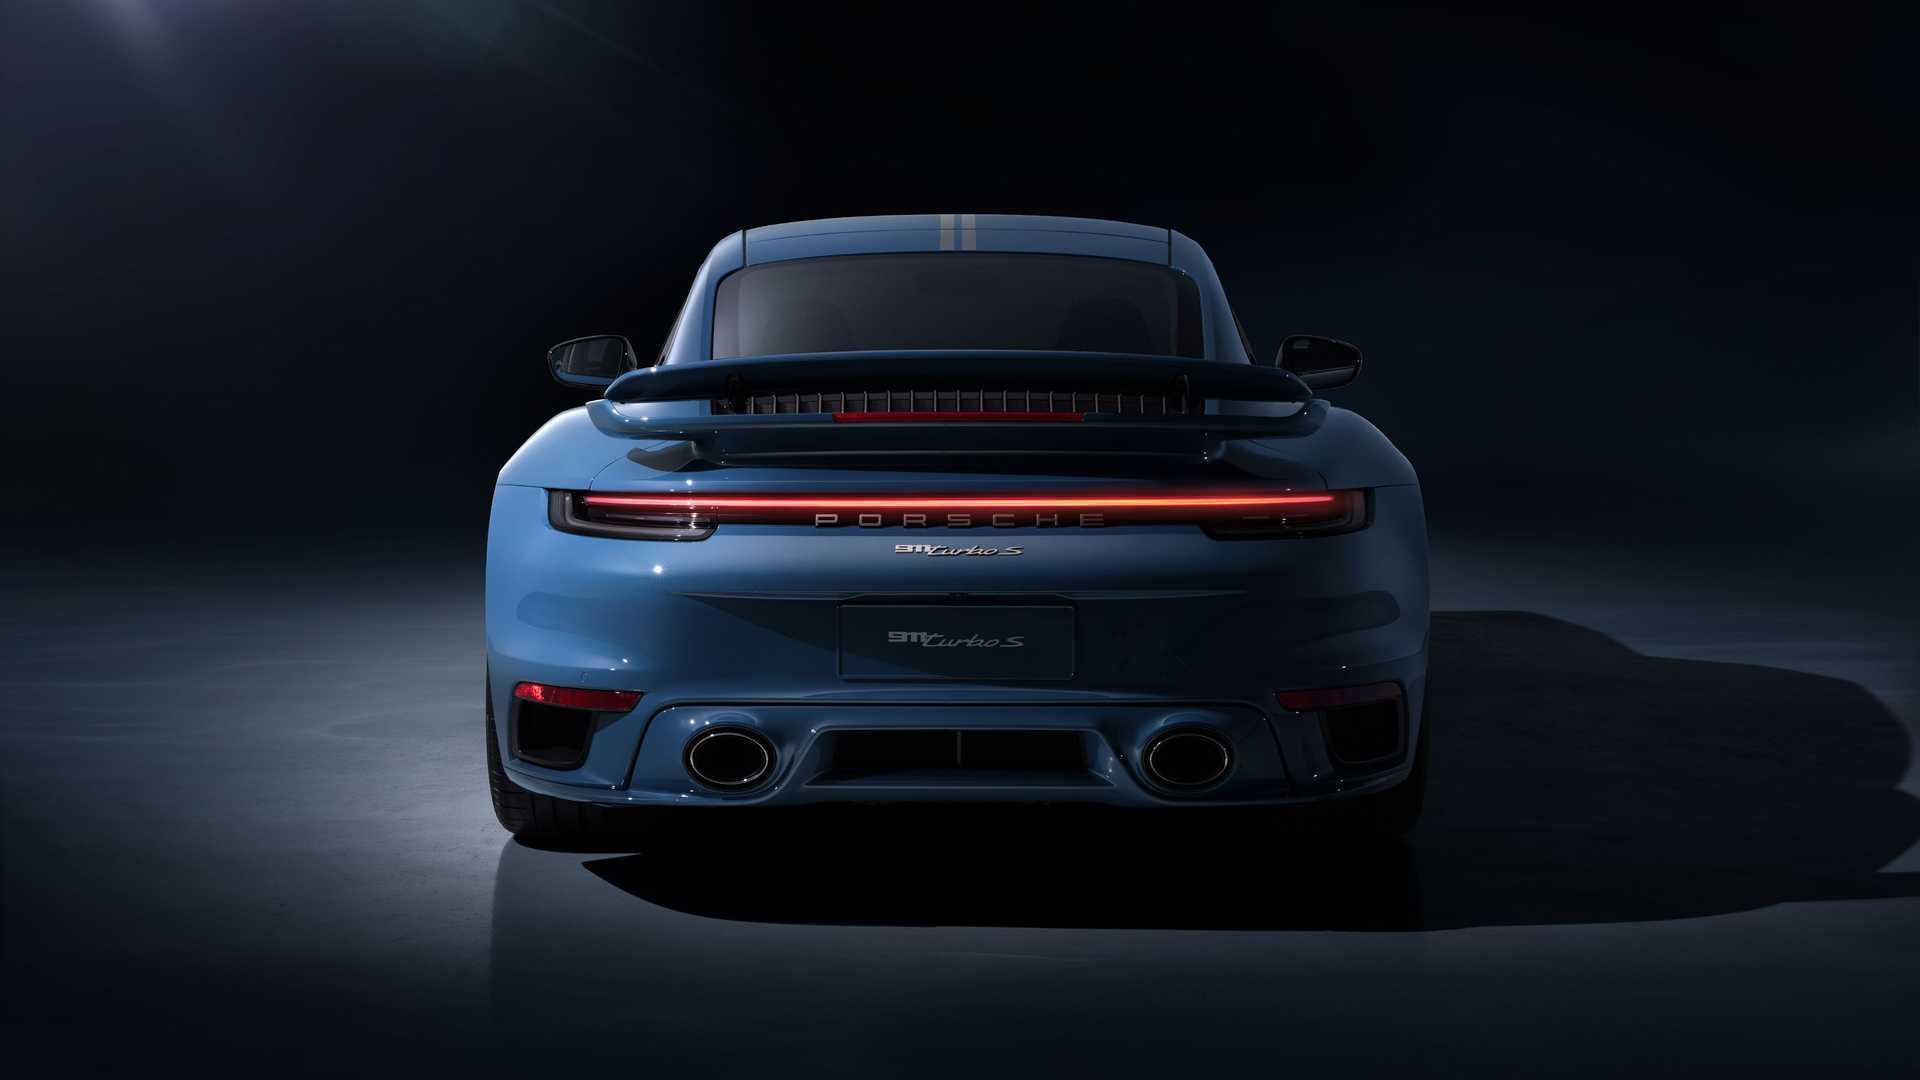 Задняя часть Porsche 911 Turbo S Porsche China 20th Anniversary Edition